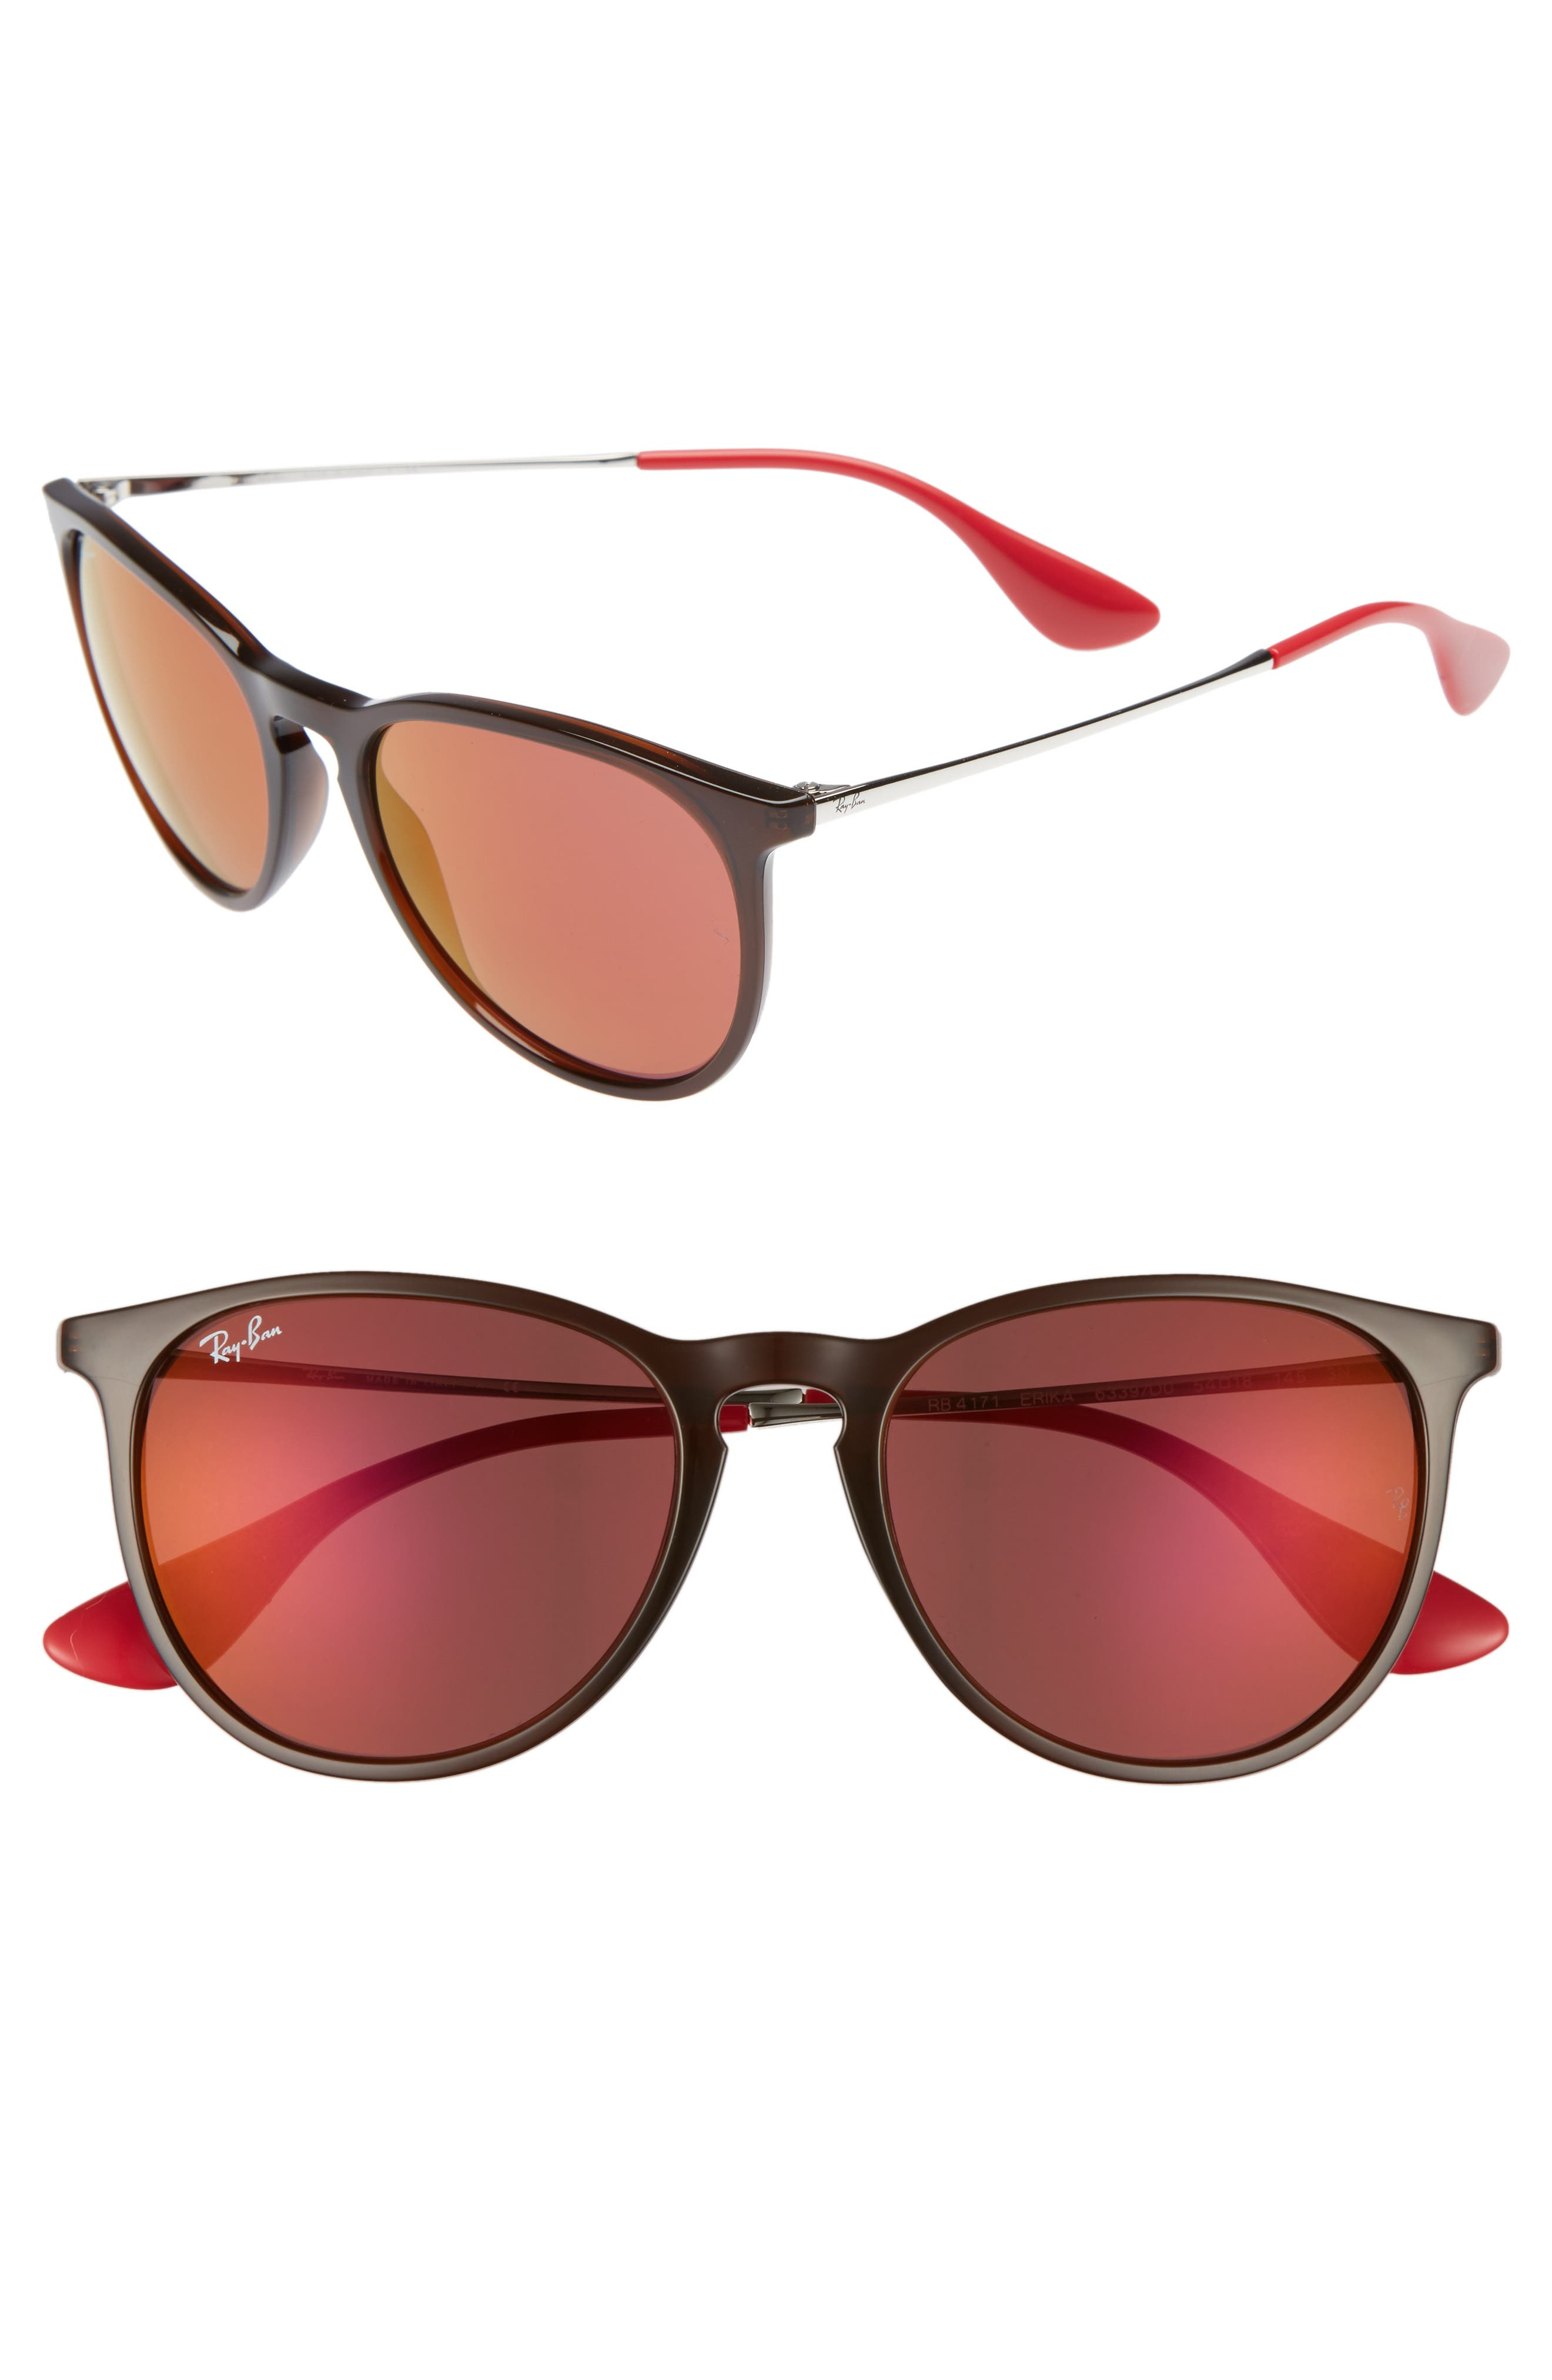 Erika Classic 54mm Sunglasses,                         Main,                         color, 203